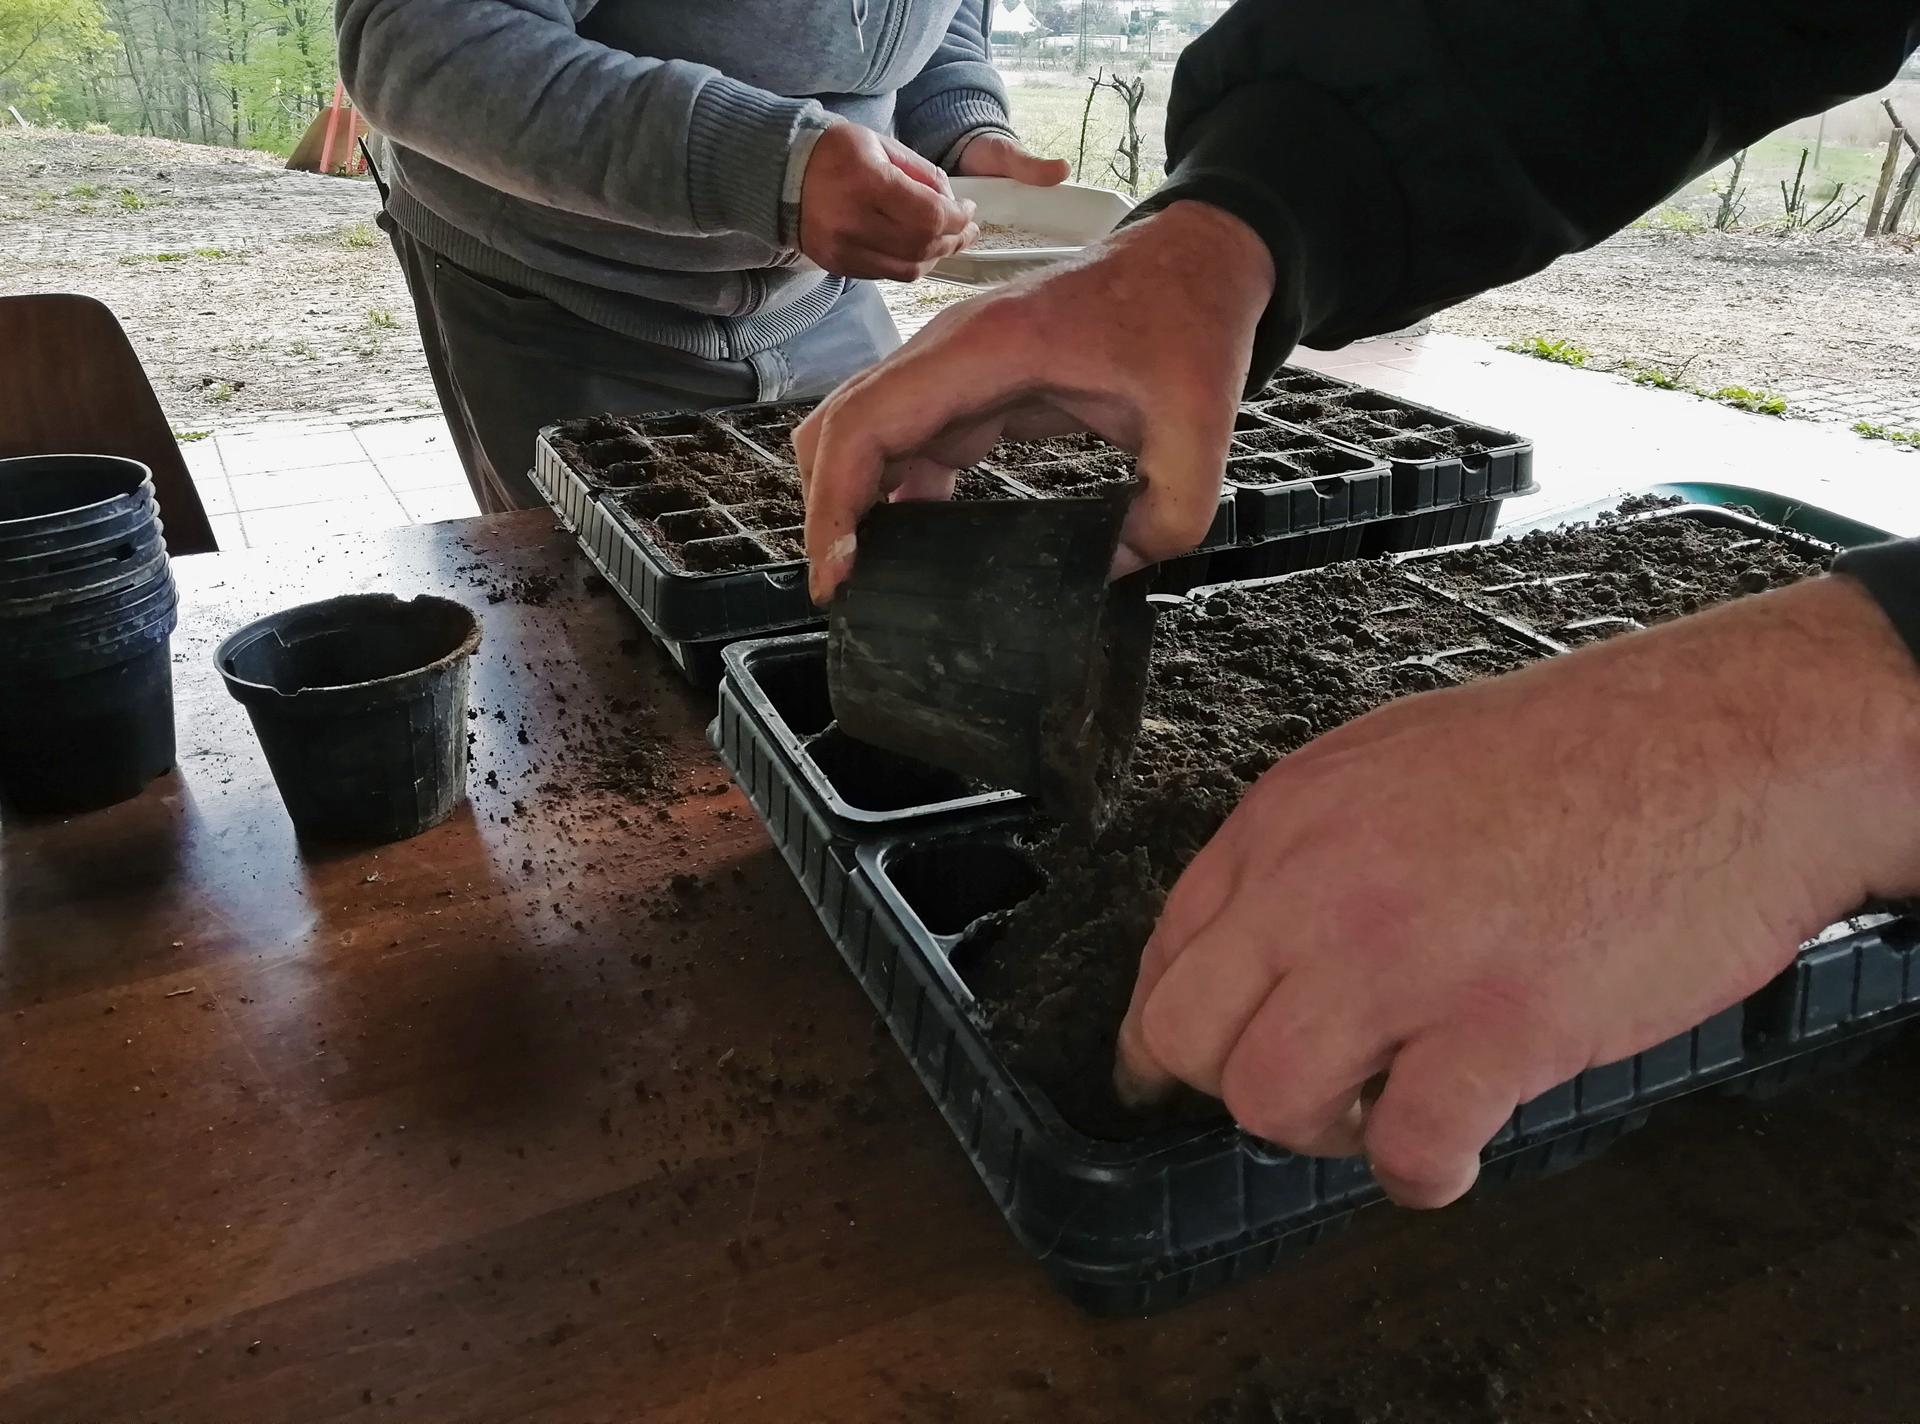 biodiversità - cassette di terra e mani